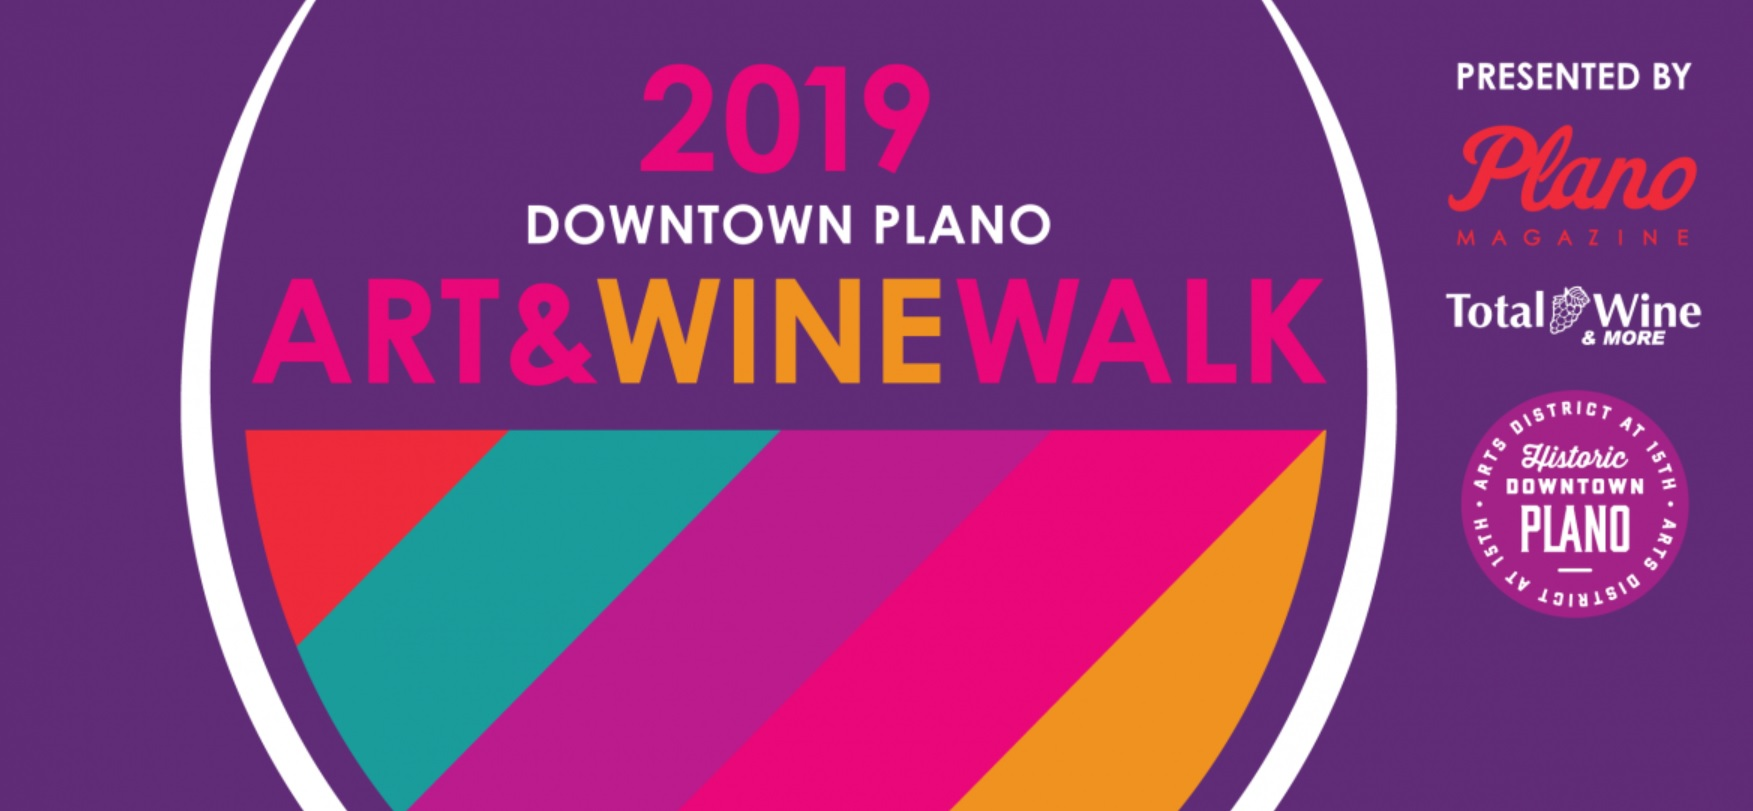 Plano Art Walk 2019.jpg